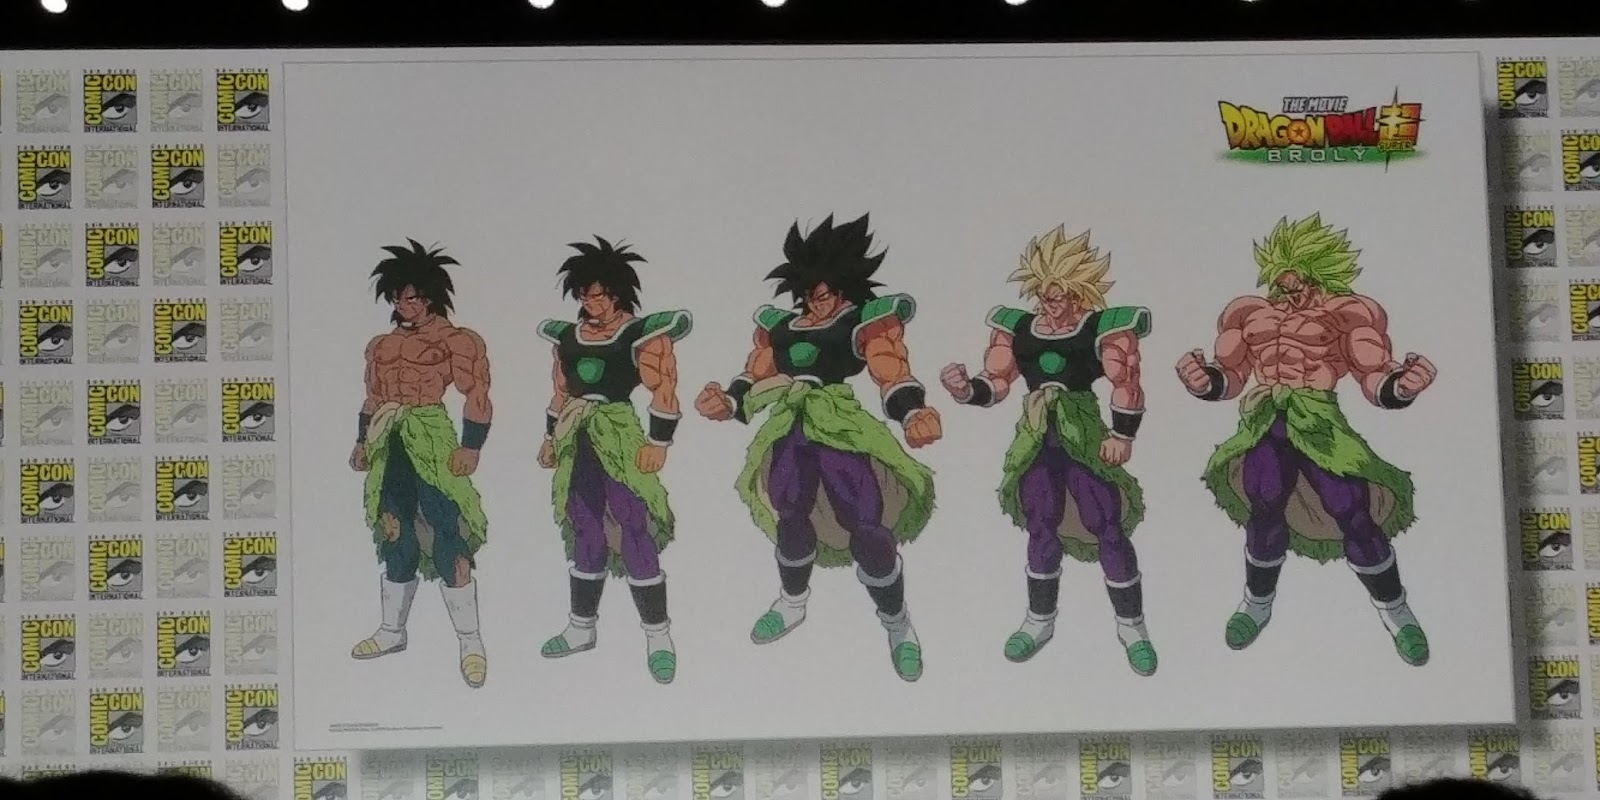 Diseño personaje Broly 2019 - Dragon Ball Super OVA